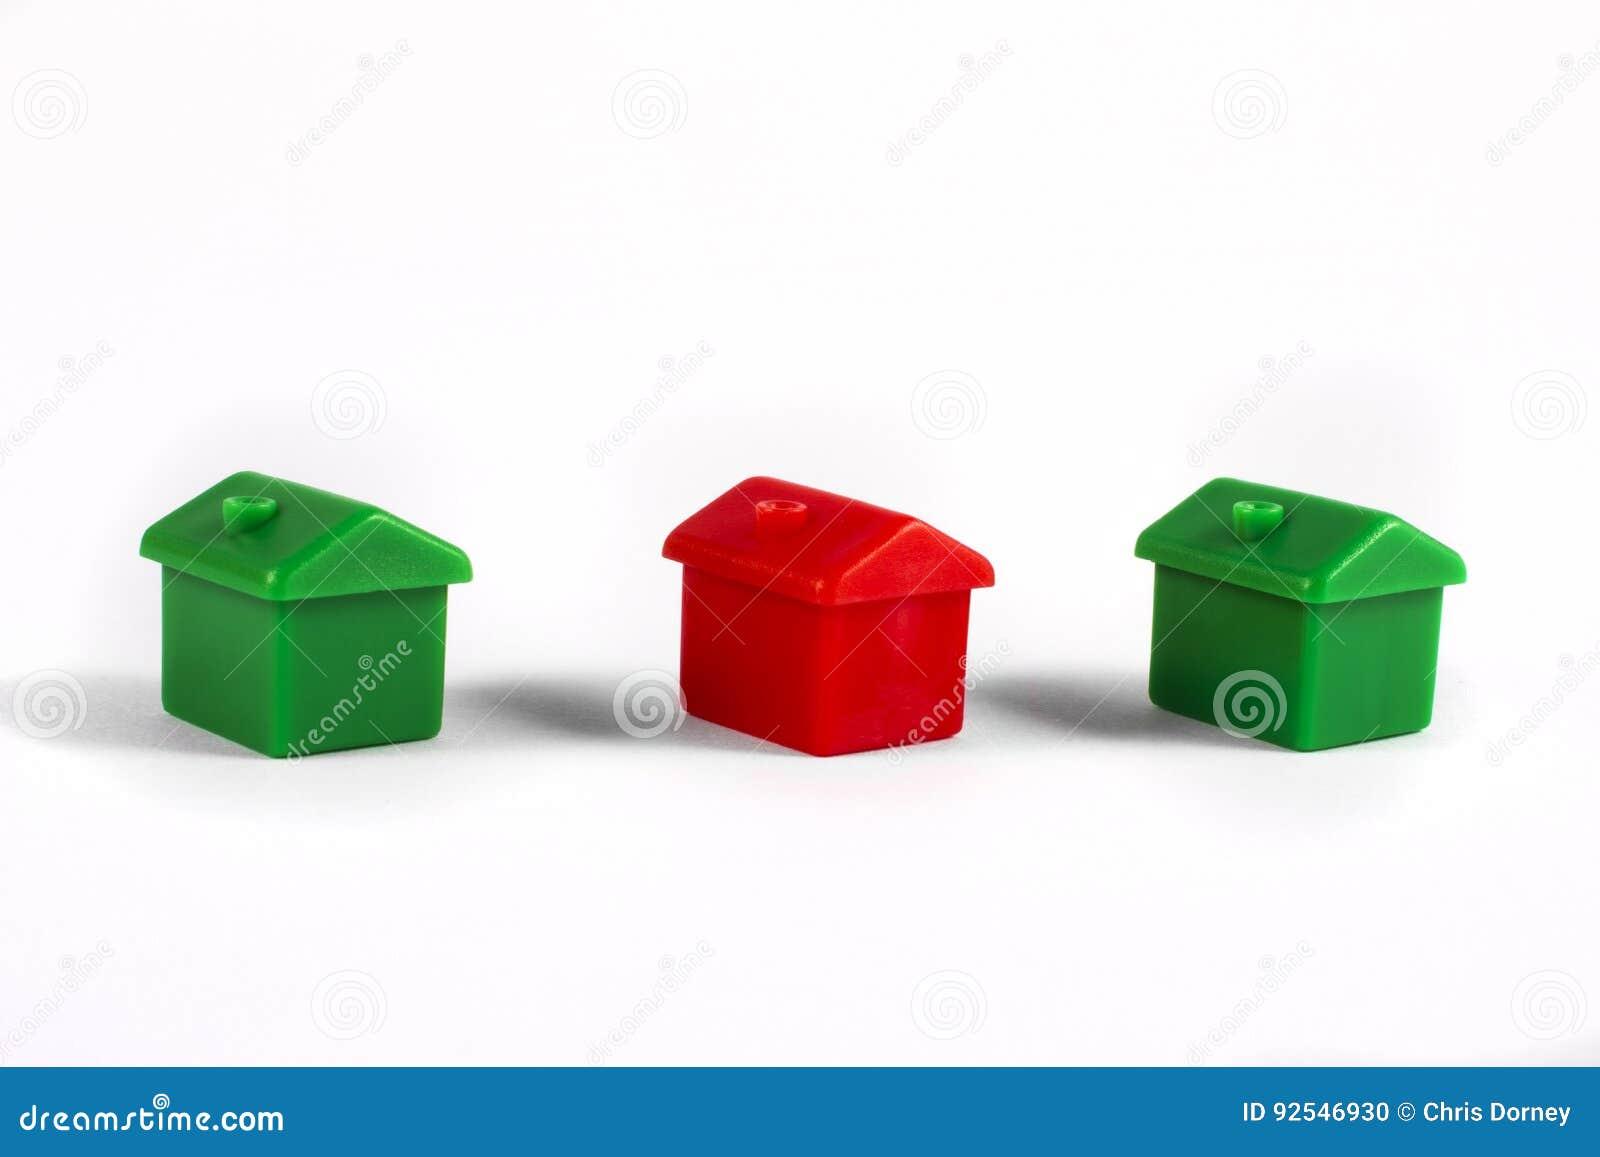 Toy Houses over een Witte Achtergrond